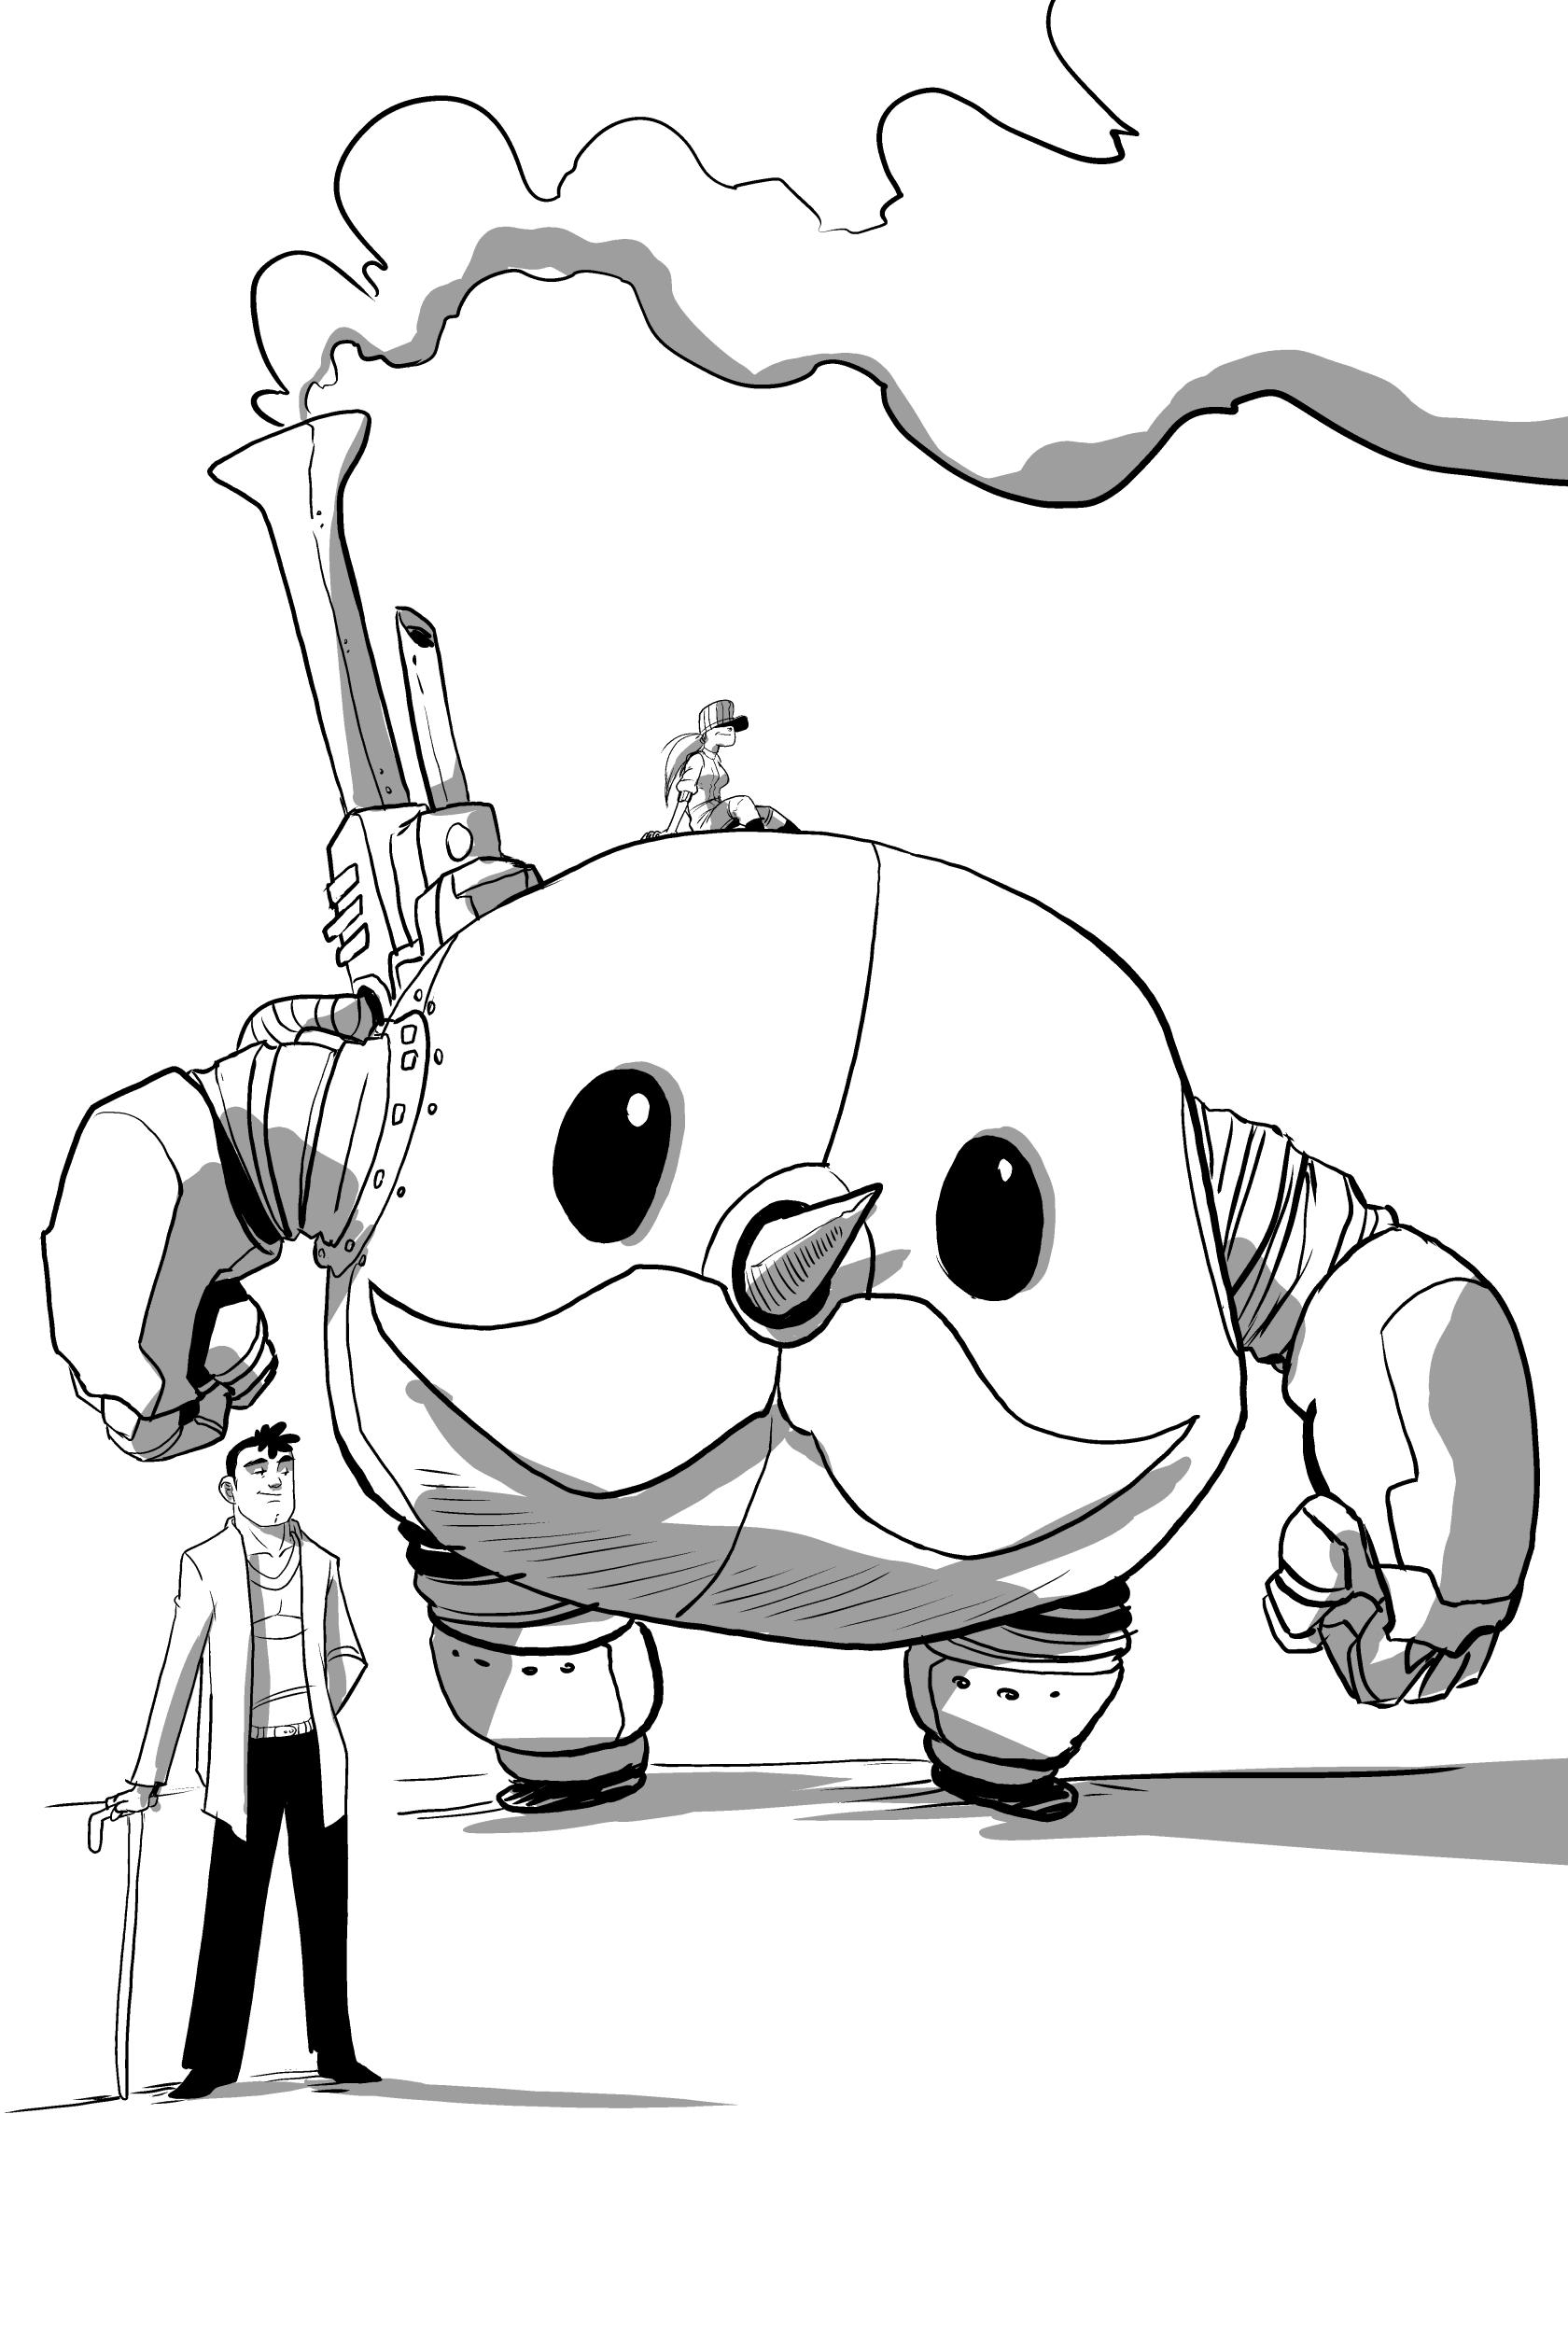 Mr. Engine